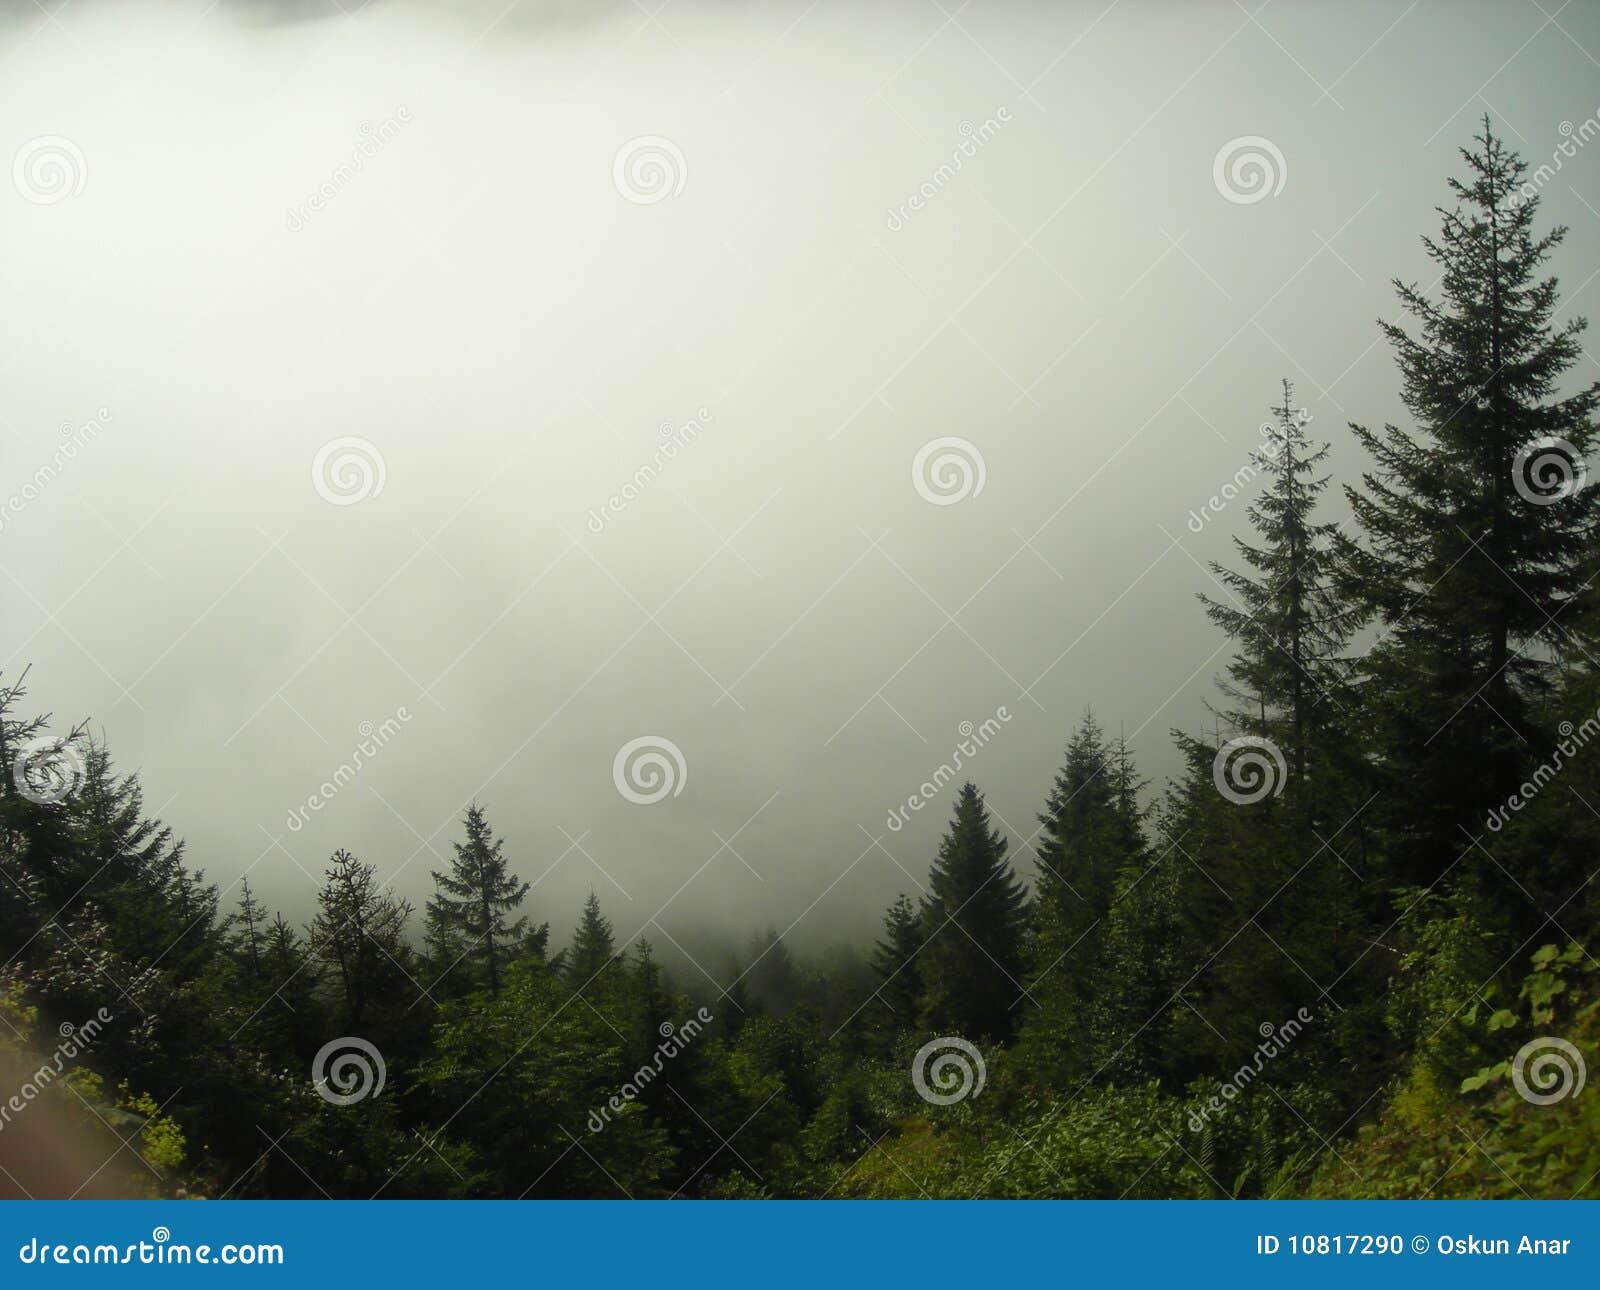 Kackar βουνό